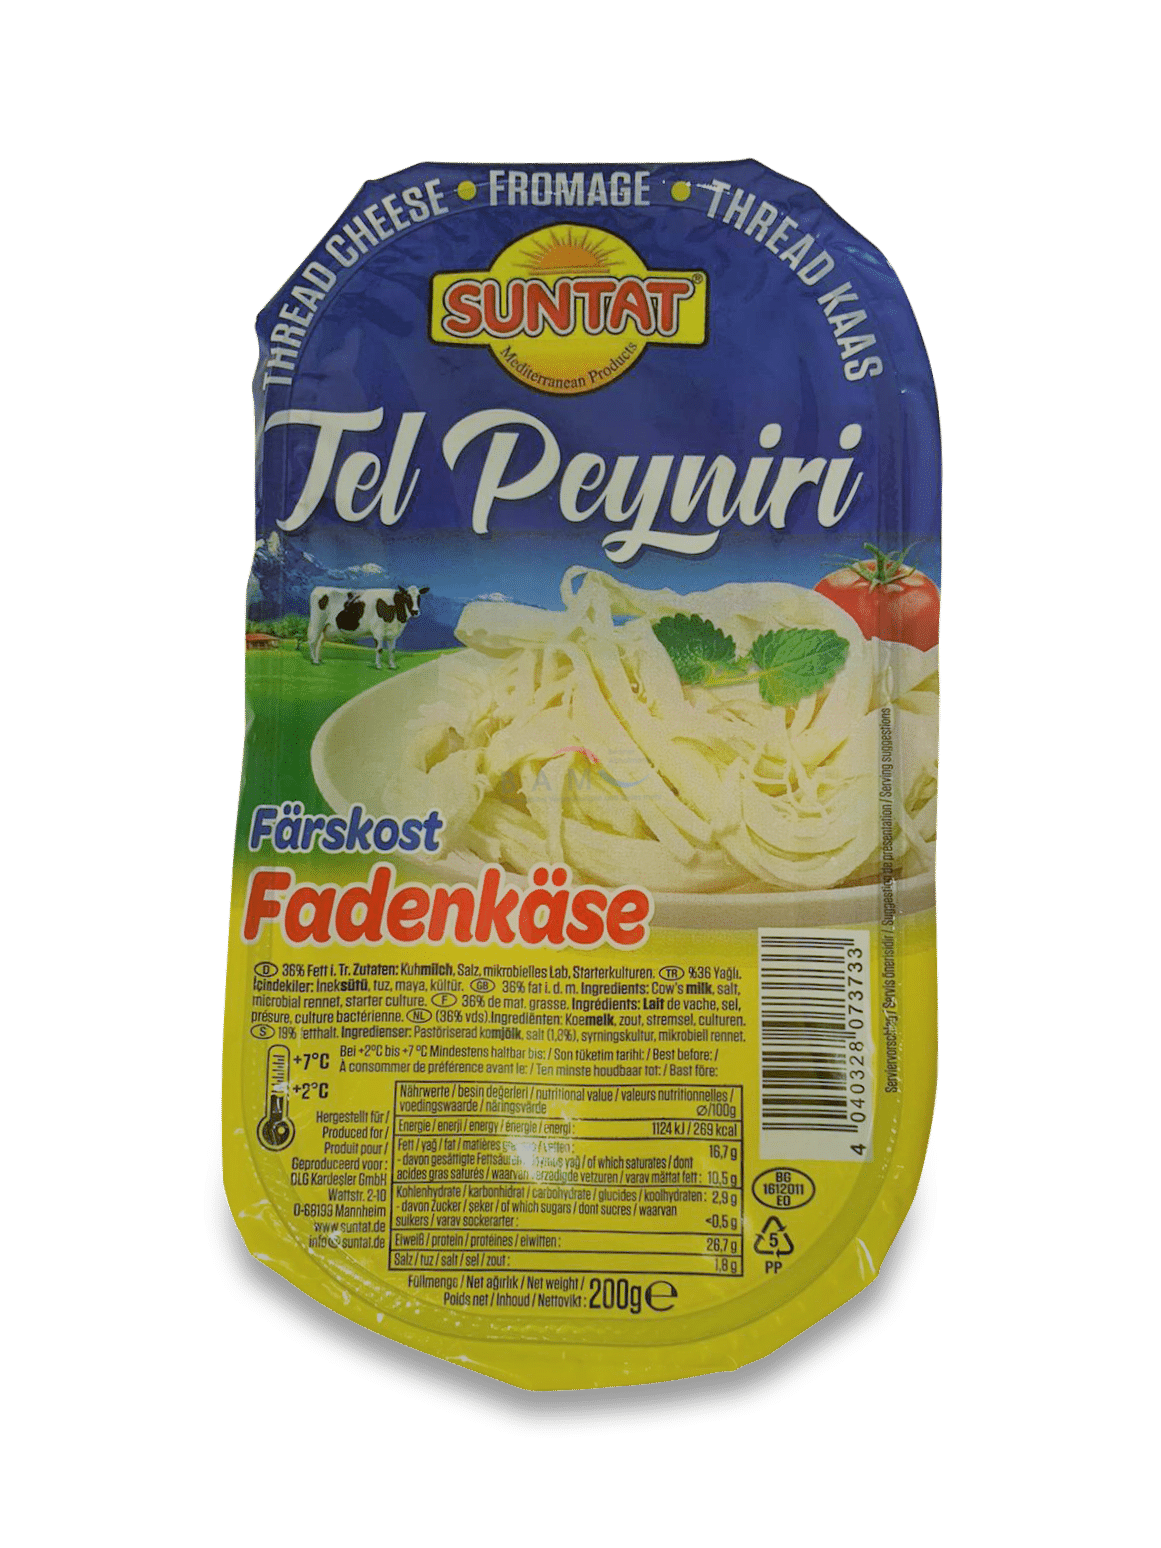 Suntat Tel Peyniri / Fadenkäse 200g